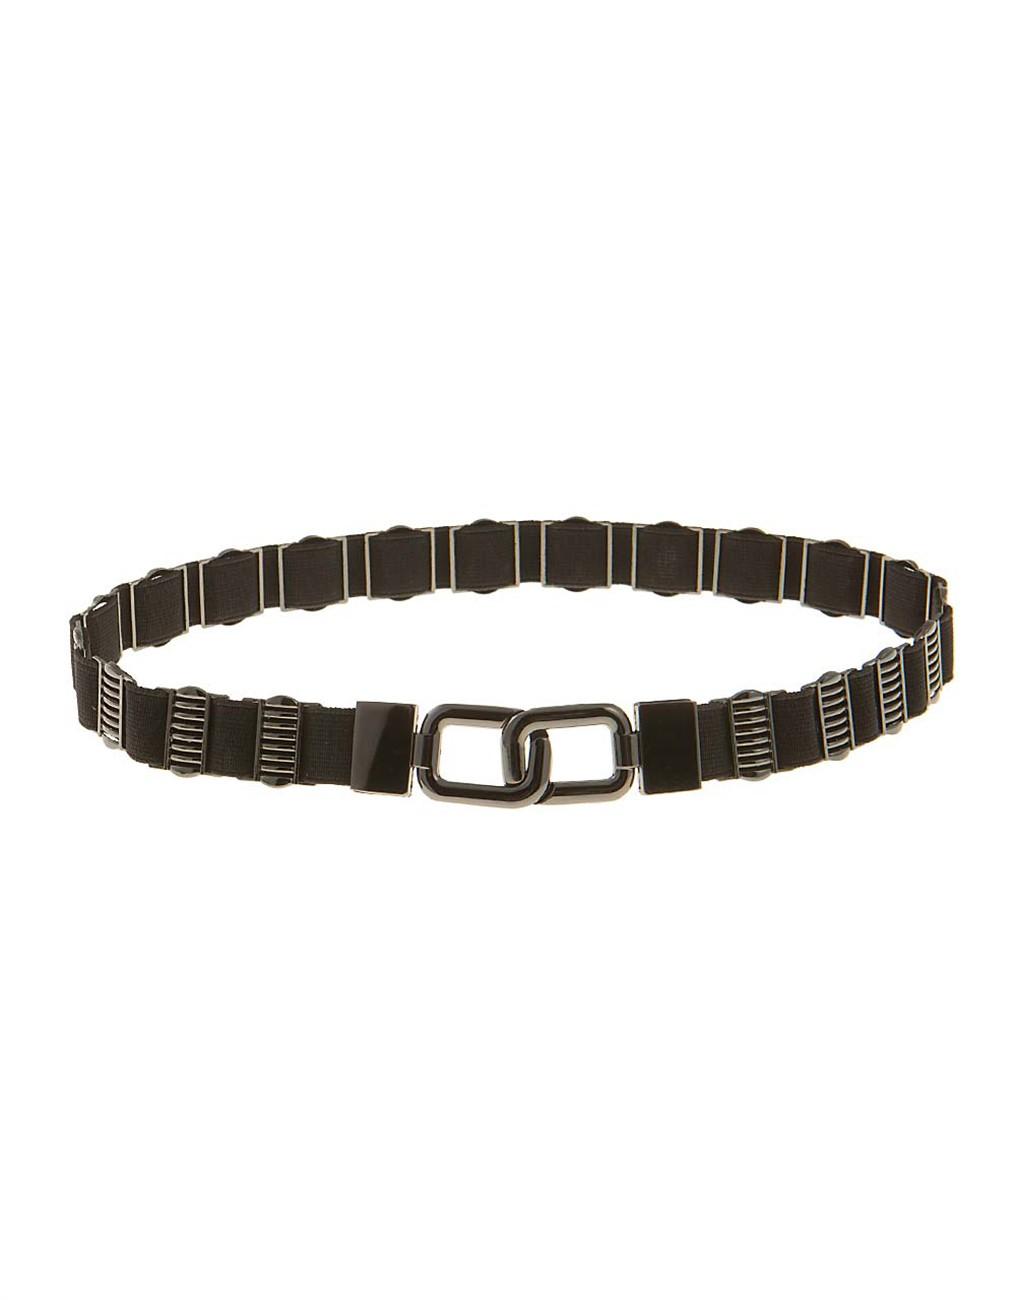 Belt with metallic elements